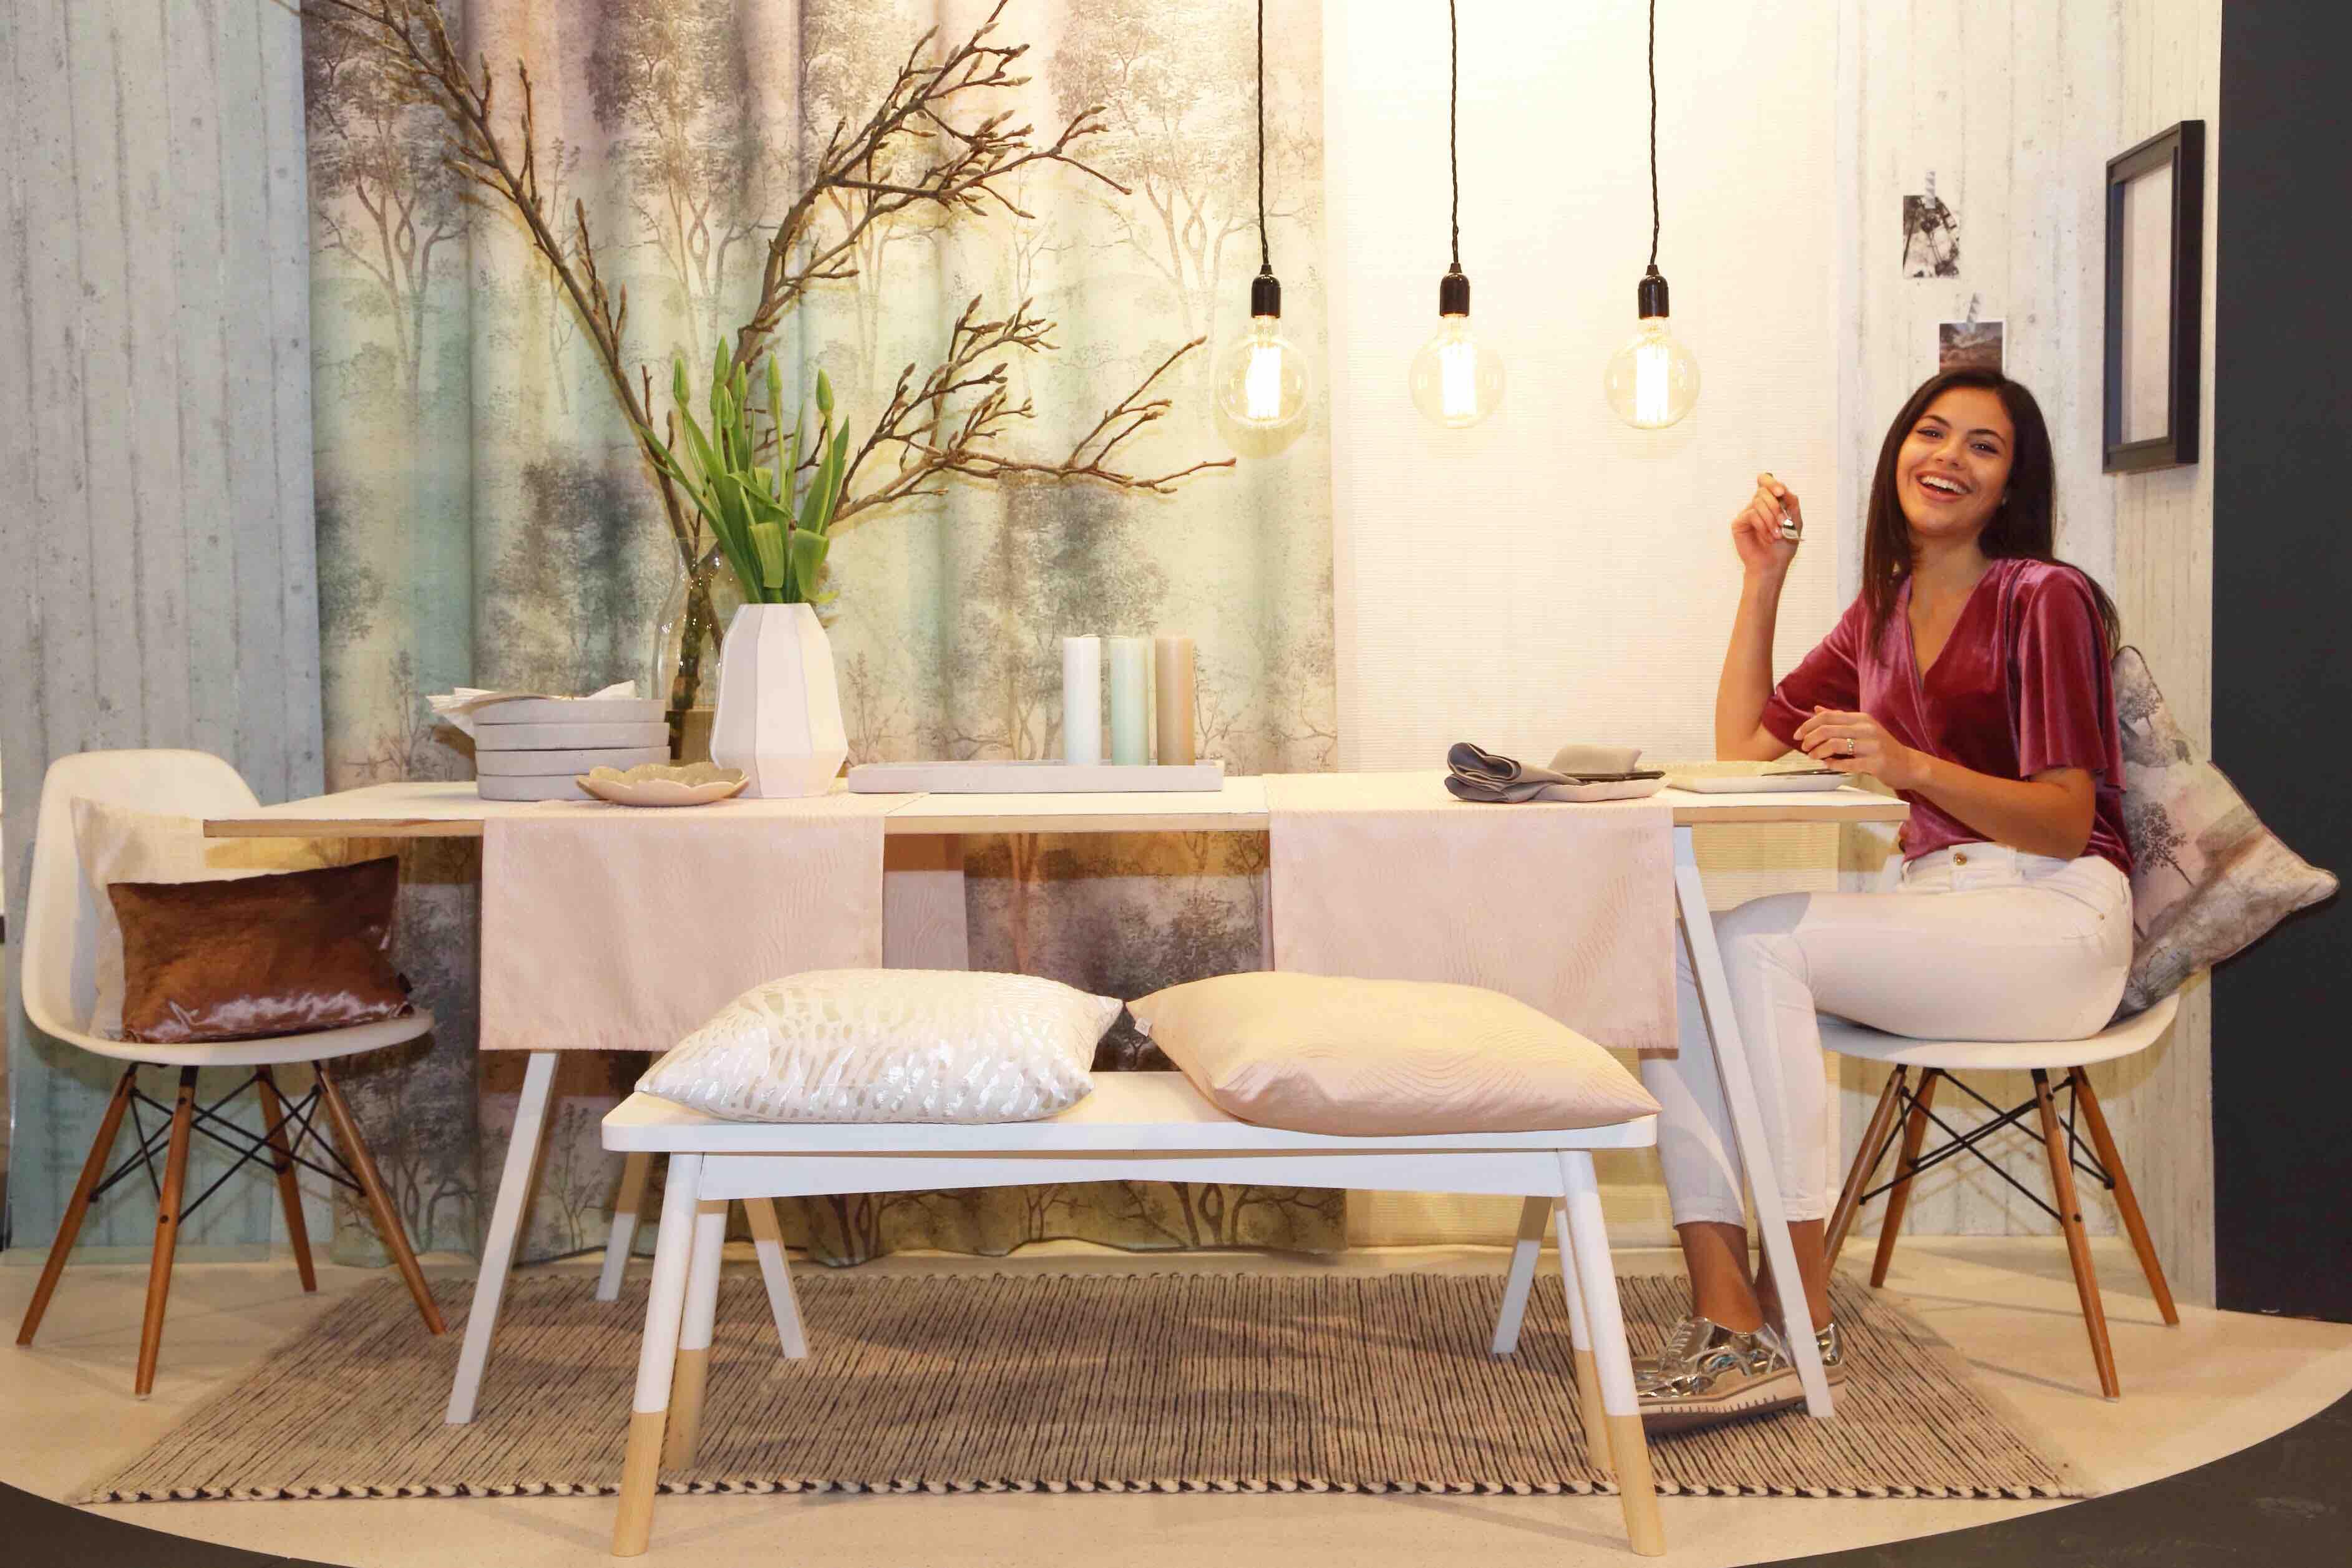 Heimtextil 2017-soft-furnishings-green-trend-botanical-prints-inteiror-decorating